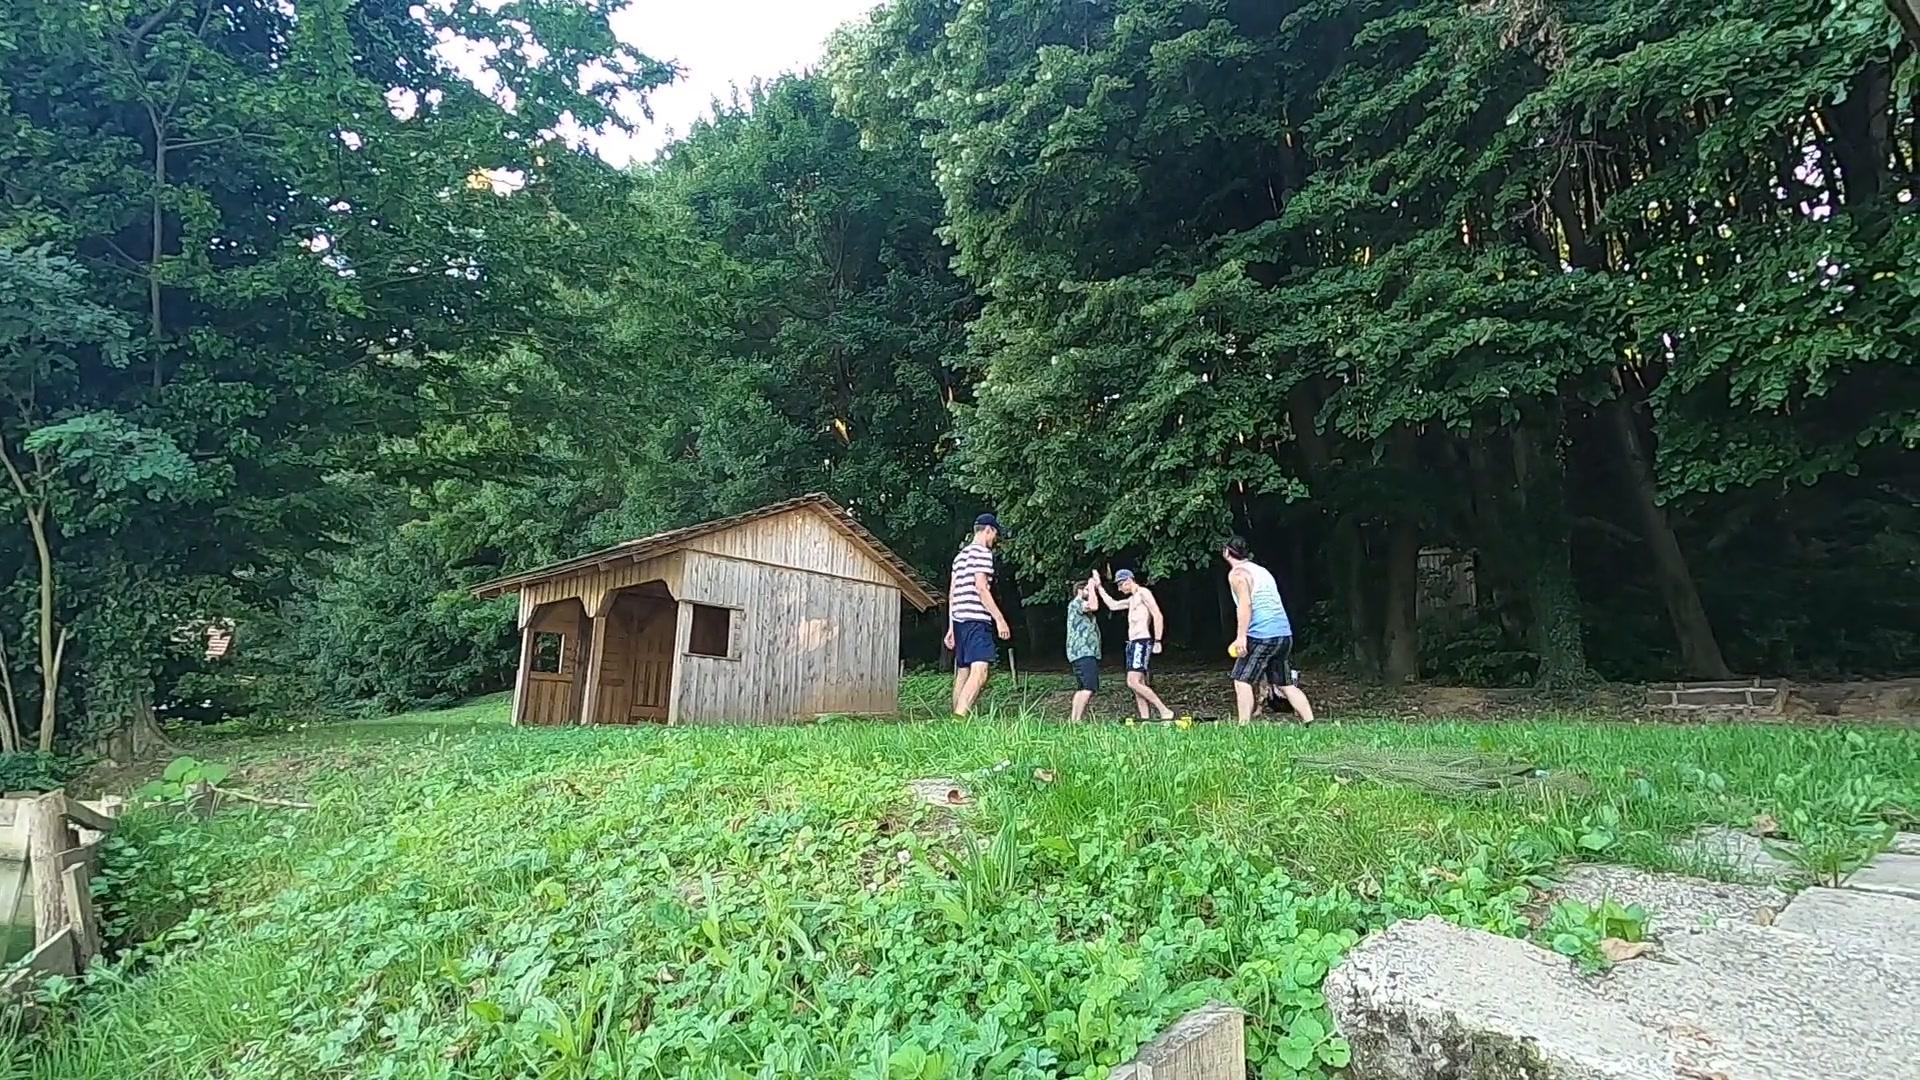 Patrick, Josef, Daniel und Silviu beim Spike Ball